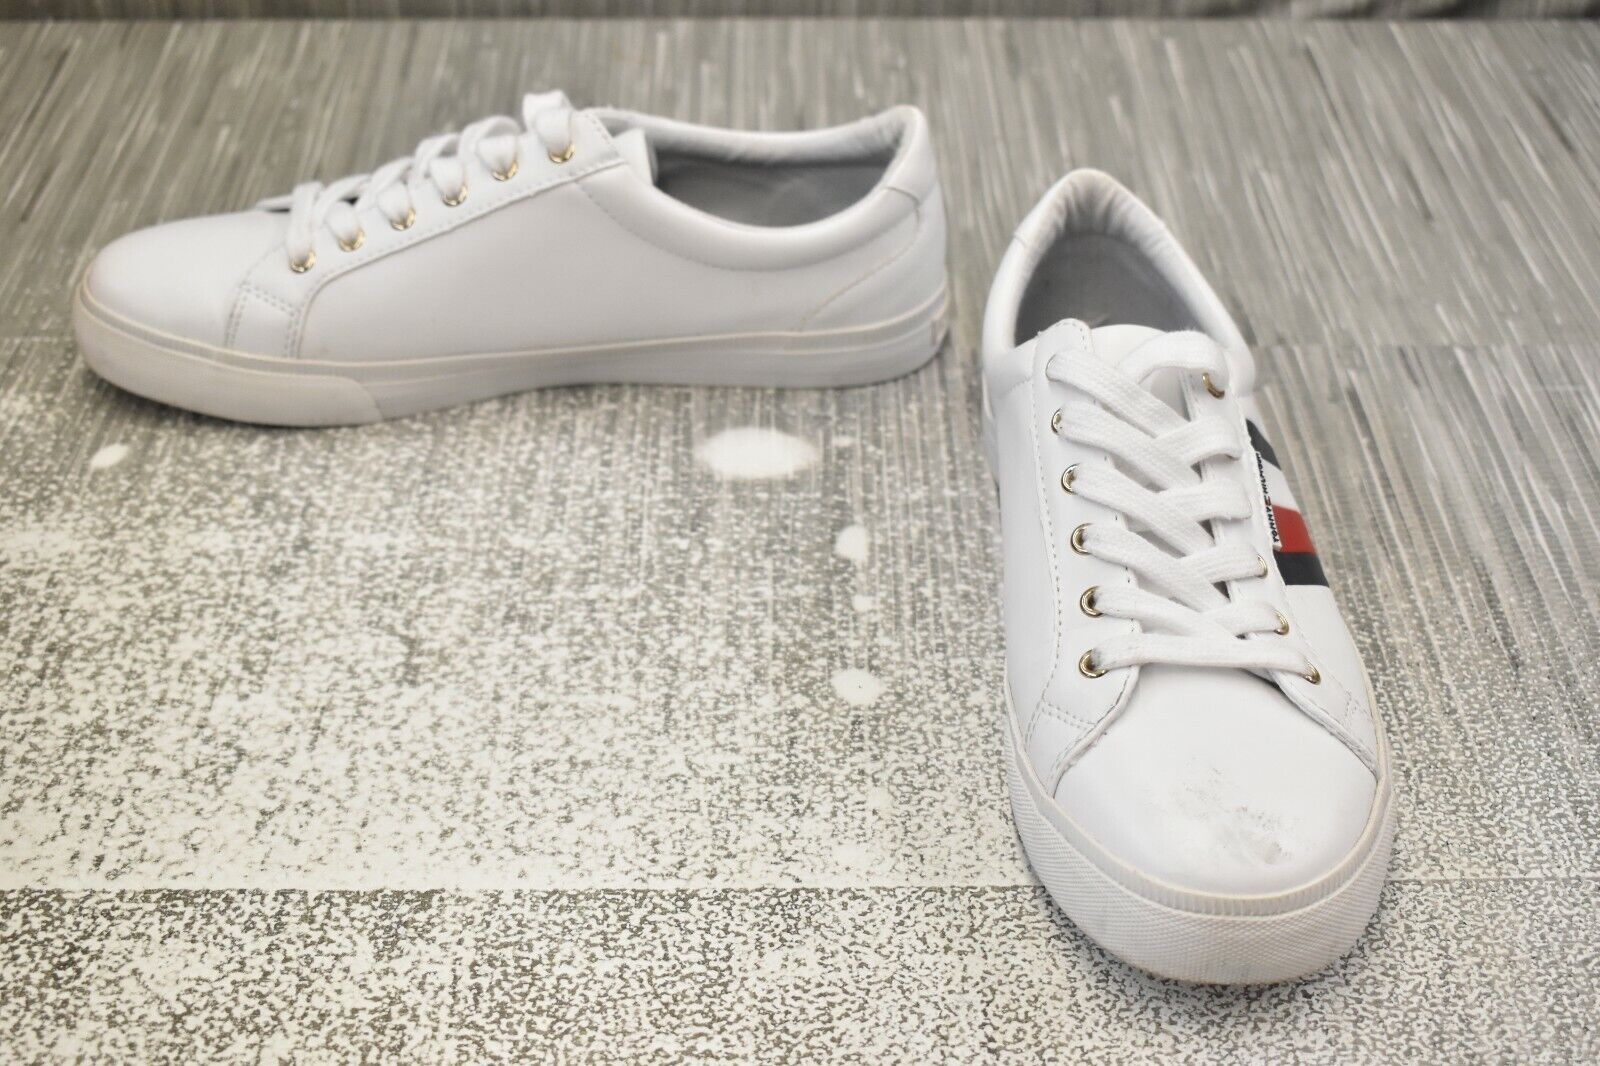 Tommy Hilfiger Lightz Casual Comfort Lace Up Shoes, Women's Size 11M, White